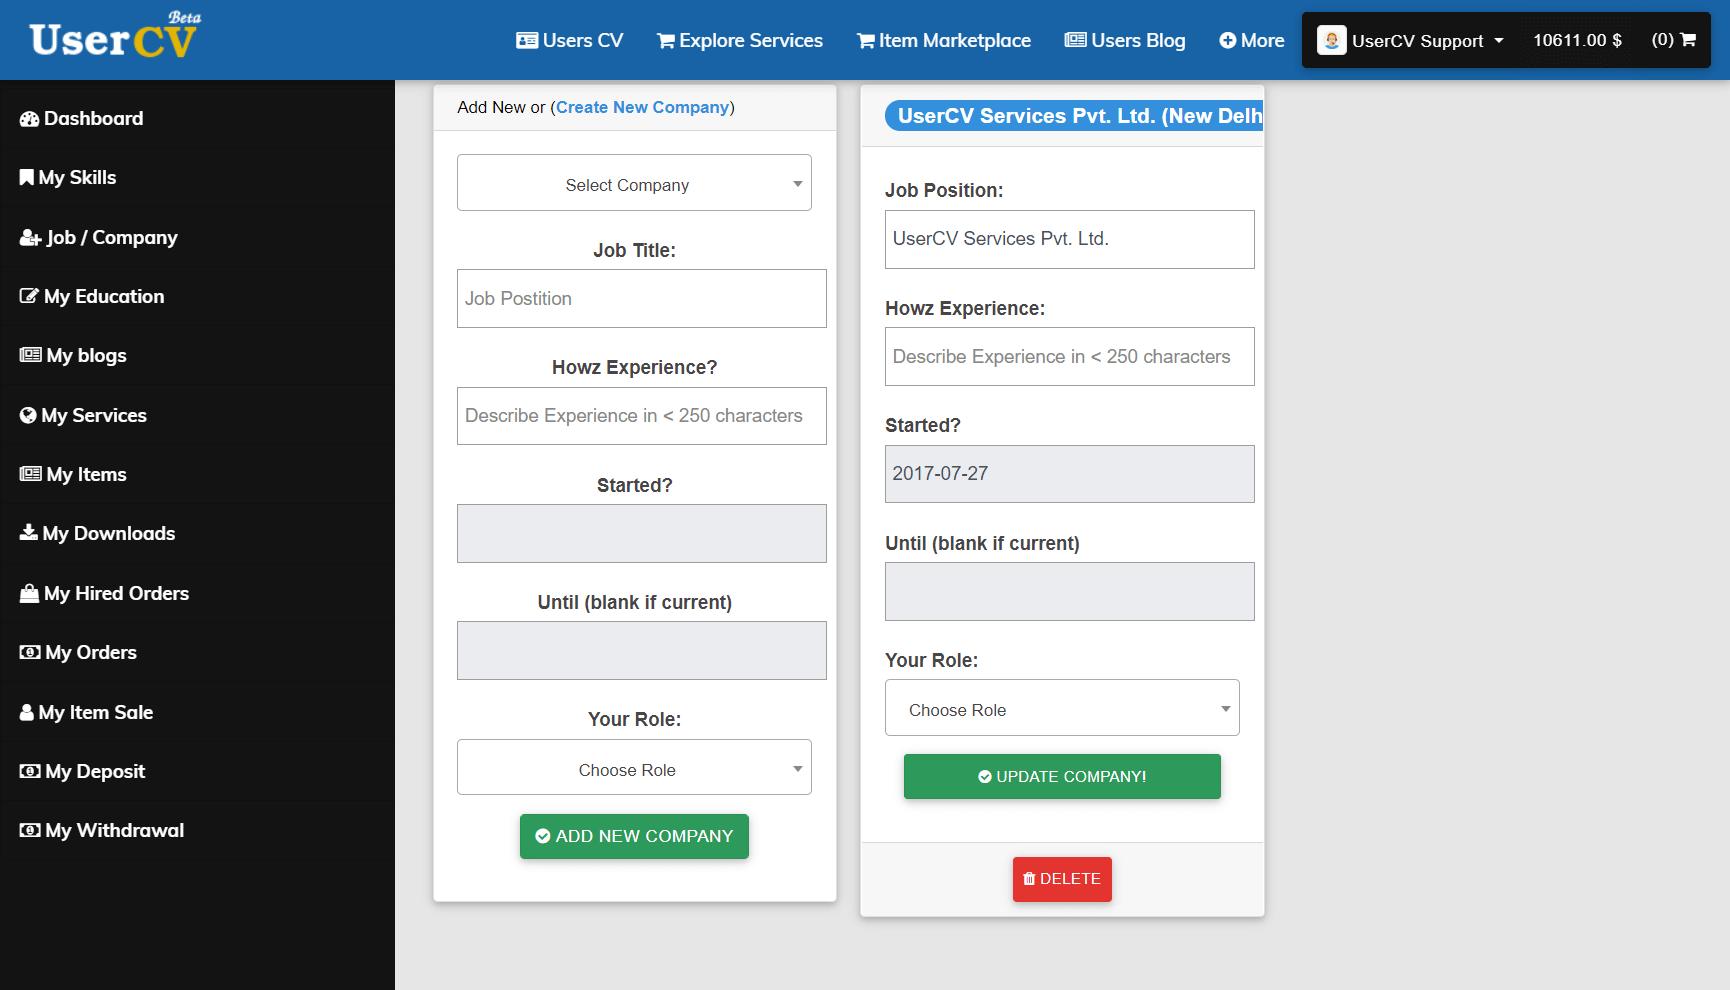 FreelancerCV - Fiverr Clone - Envato Clone - Tumblr Clone - About.me Clone (Multi Domain SAAS) - Company page list